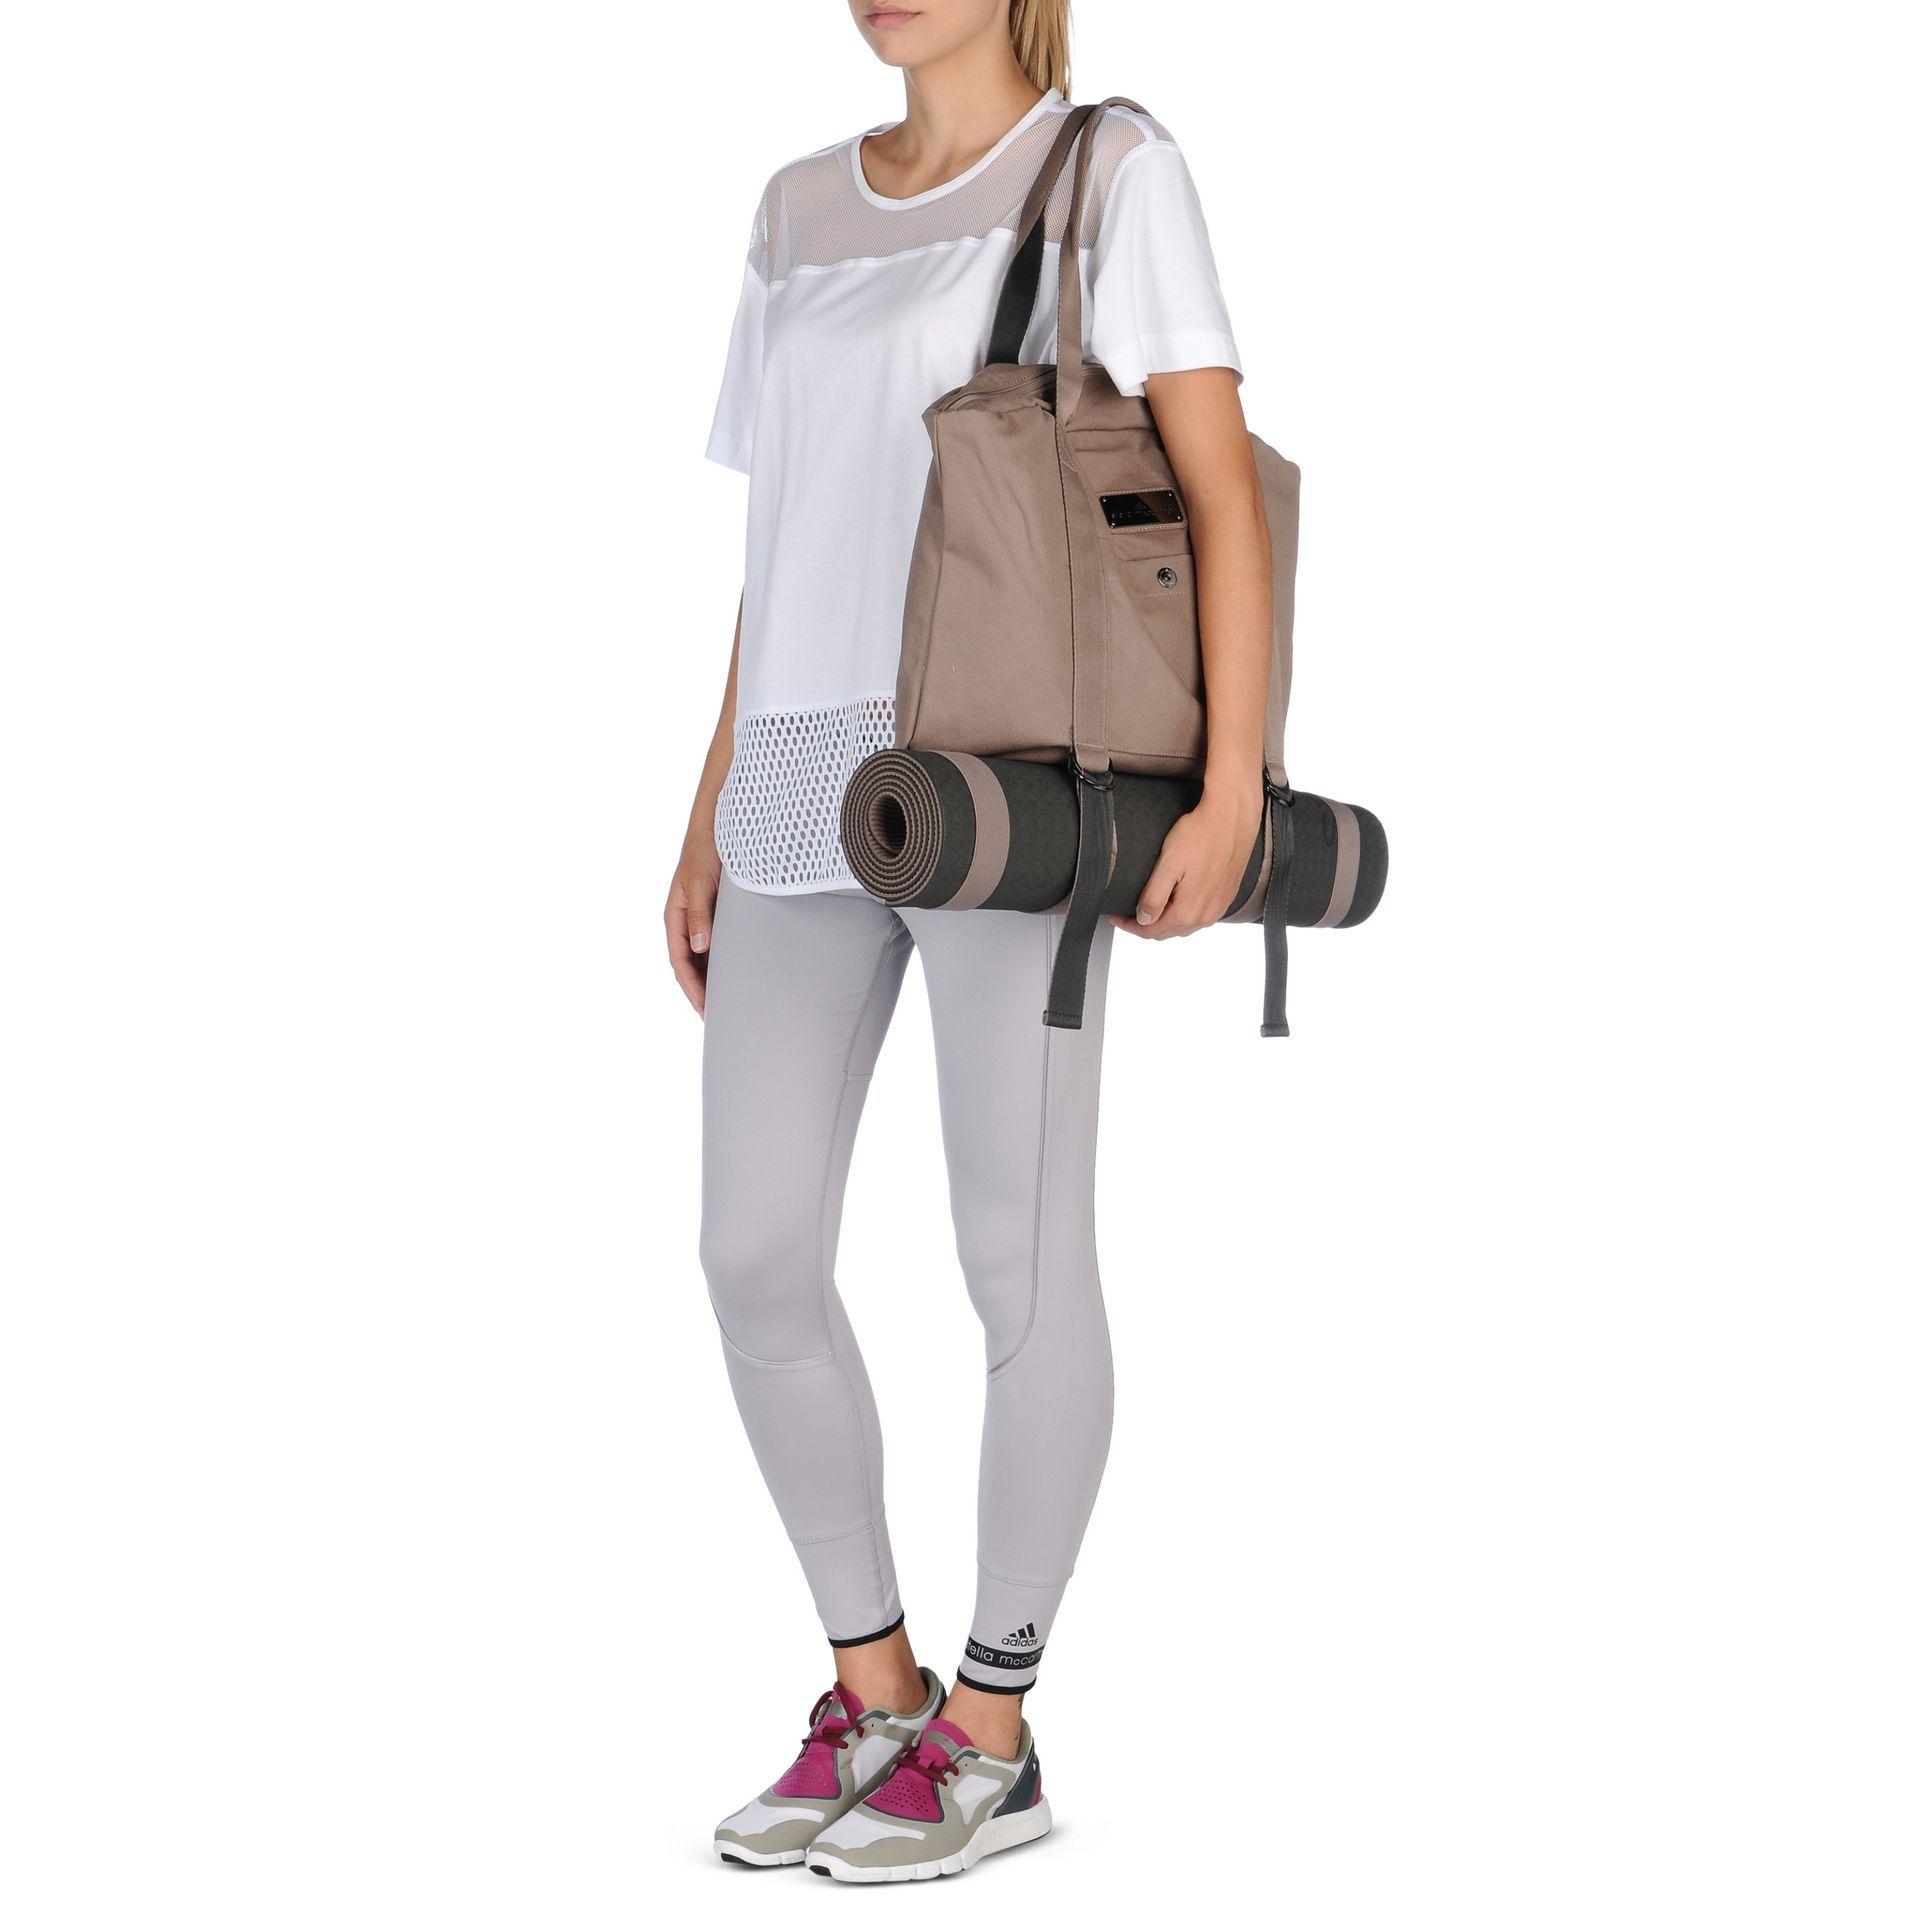 Yoga Bag - ADIDAS BY STELLA MCCARTNEY   أشغال يدويه مع شمس محمد على ... 67557c7d97